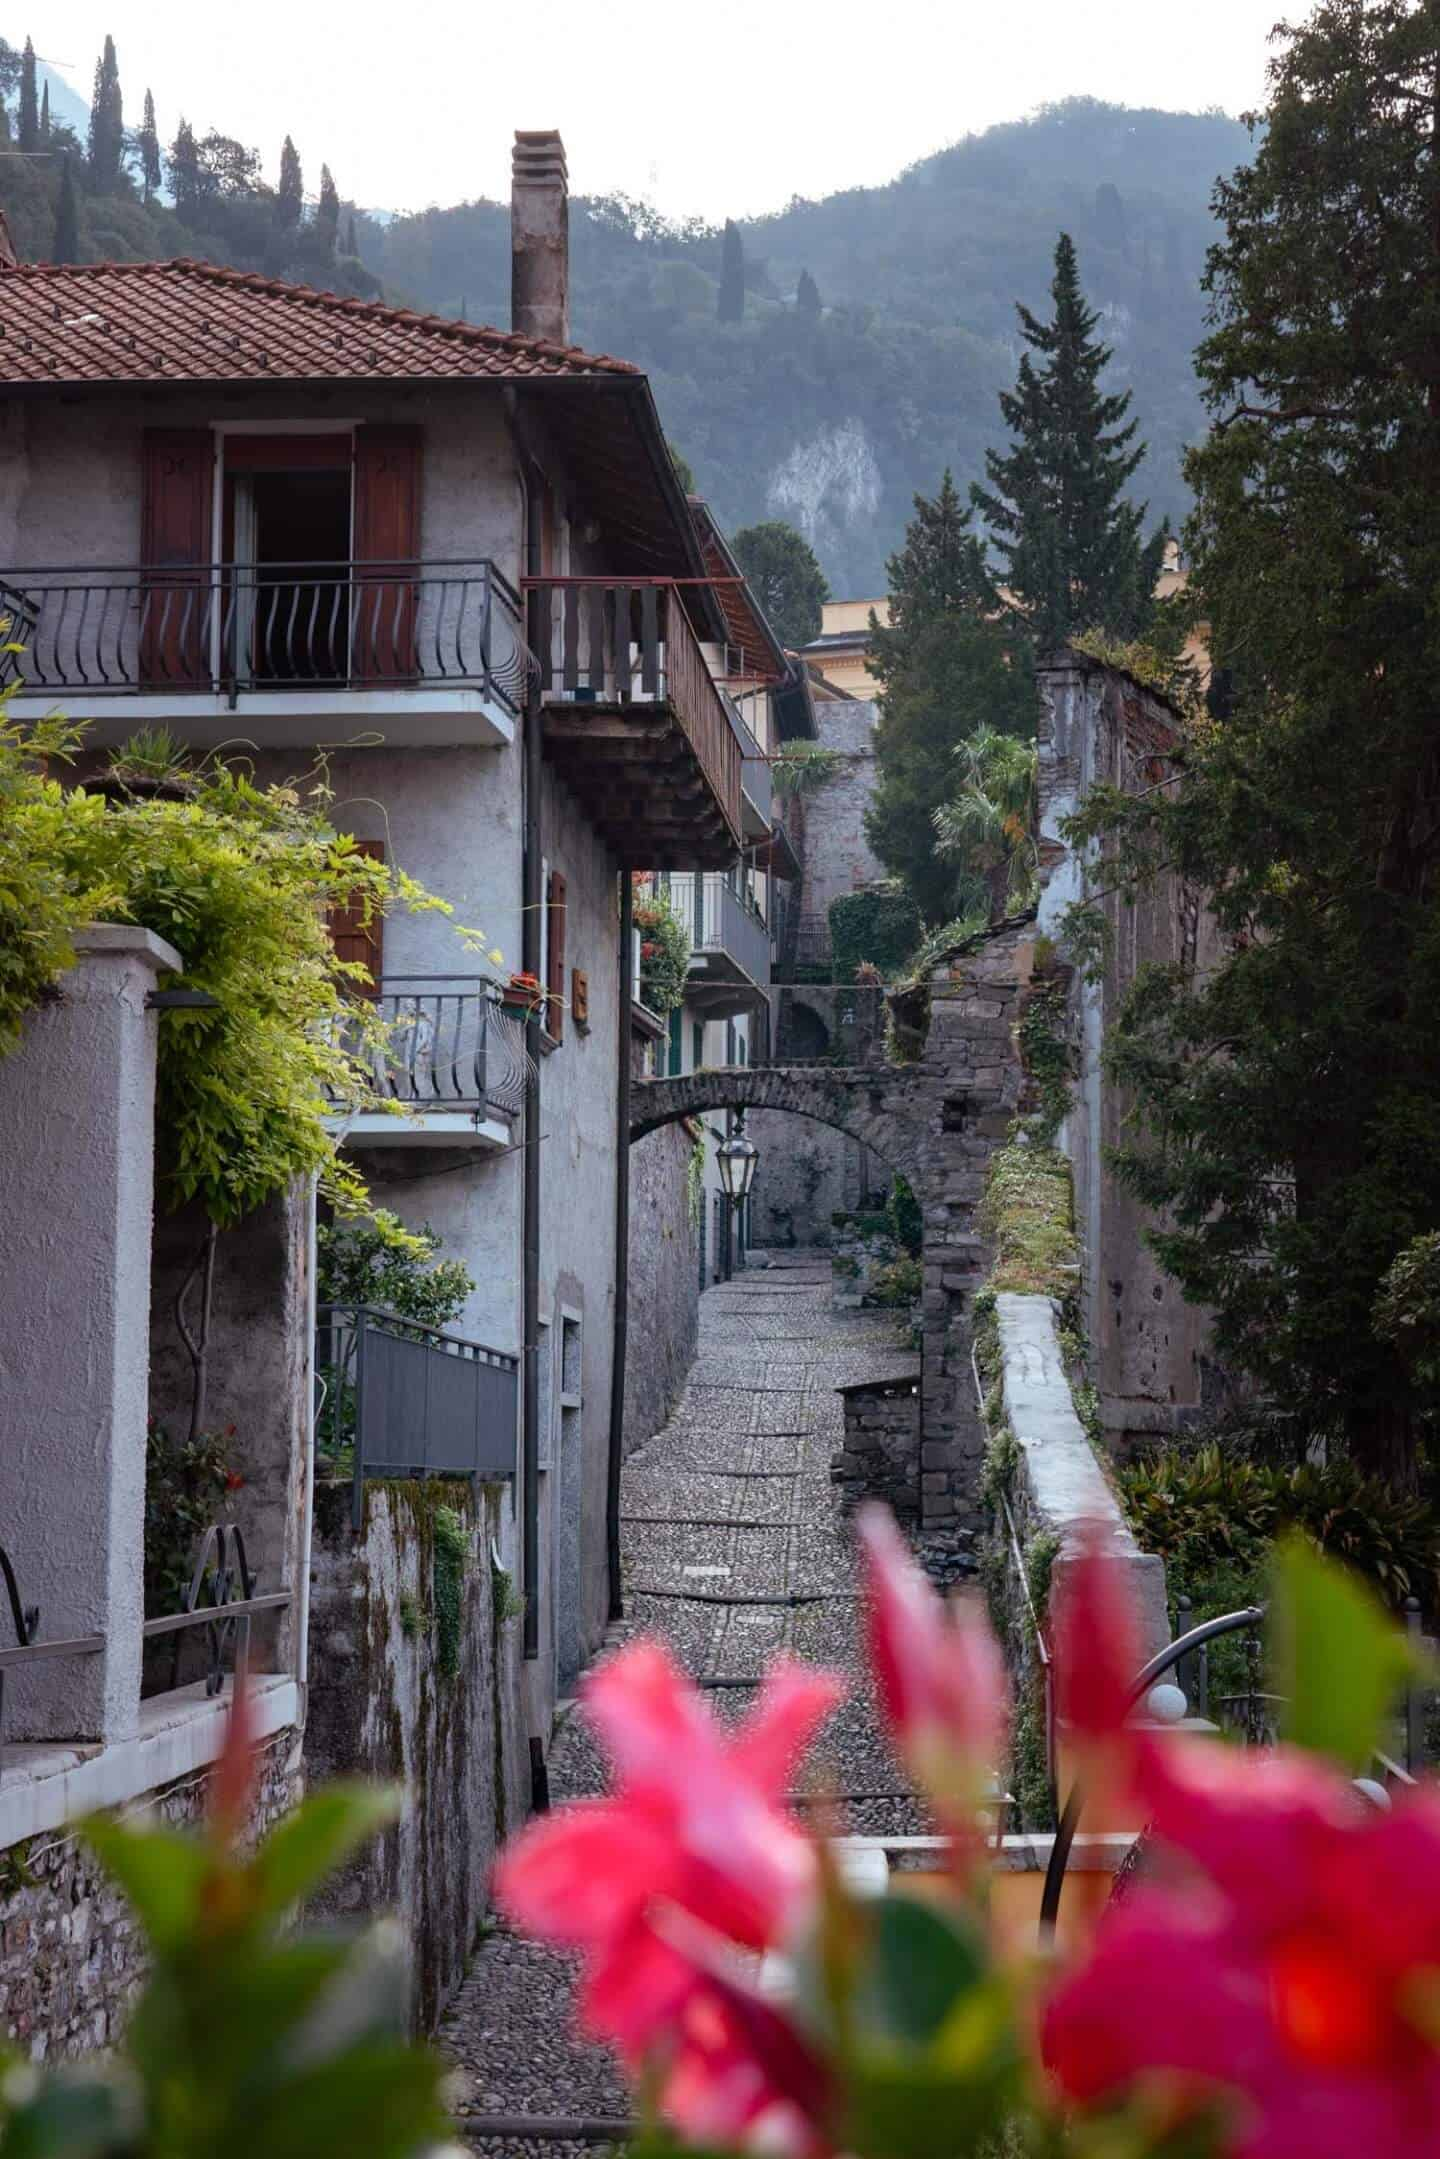 Steep narrow cobblestone streets are characteristic of Varenna, Lake Como, Italy